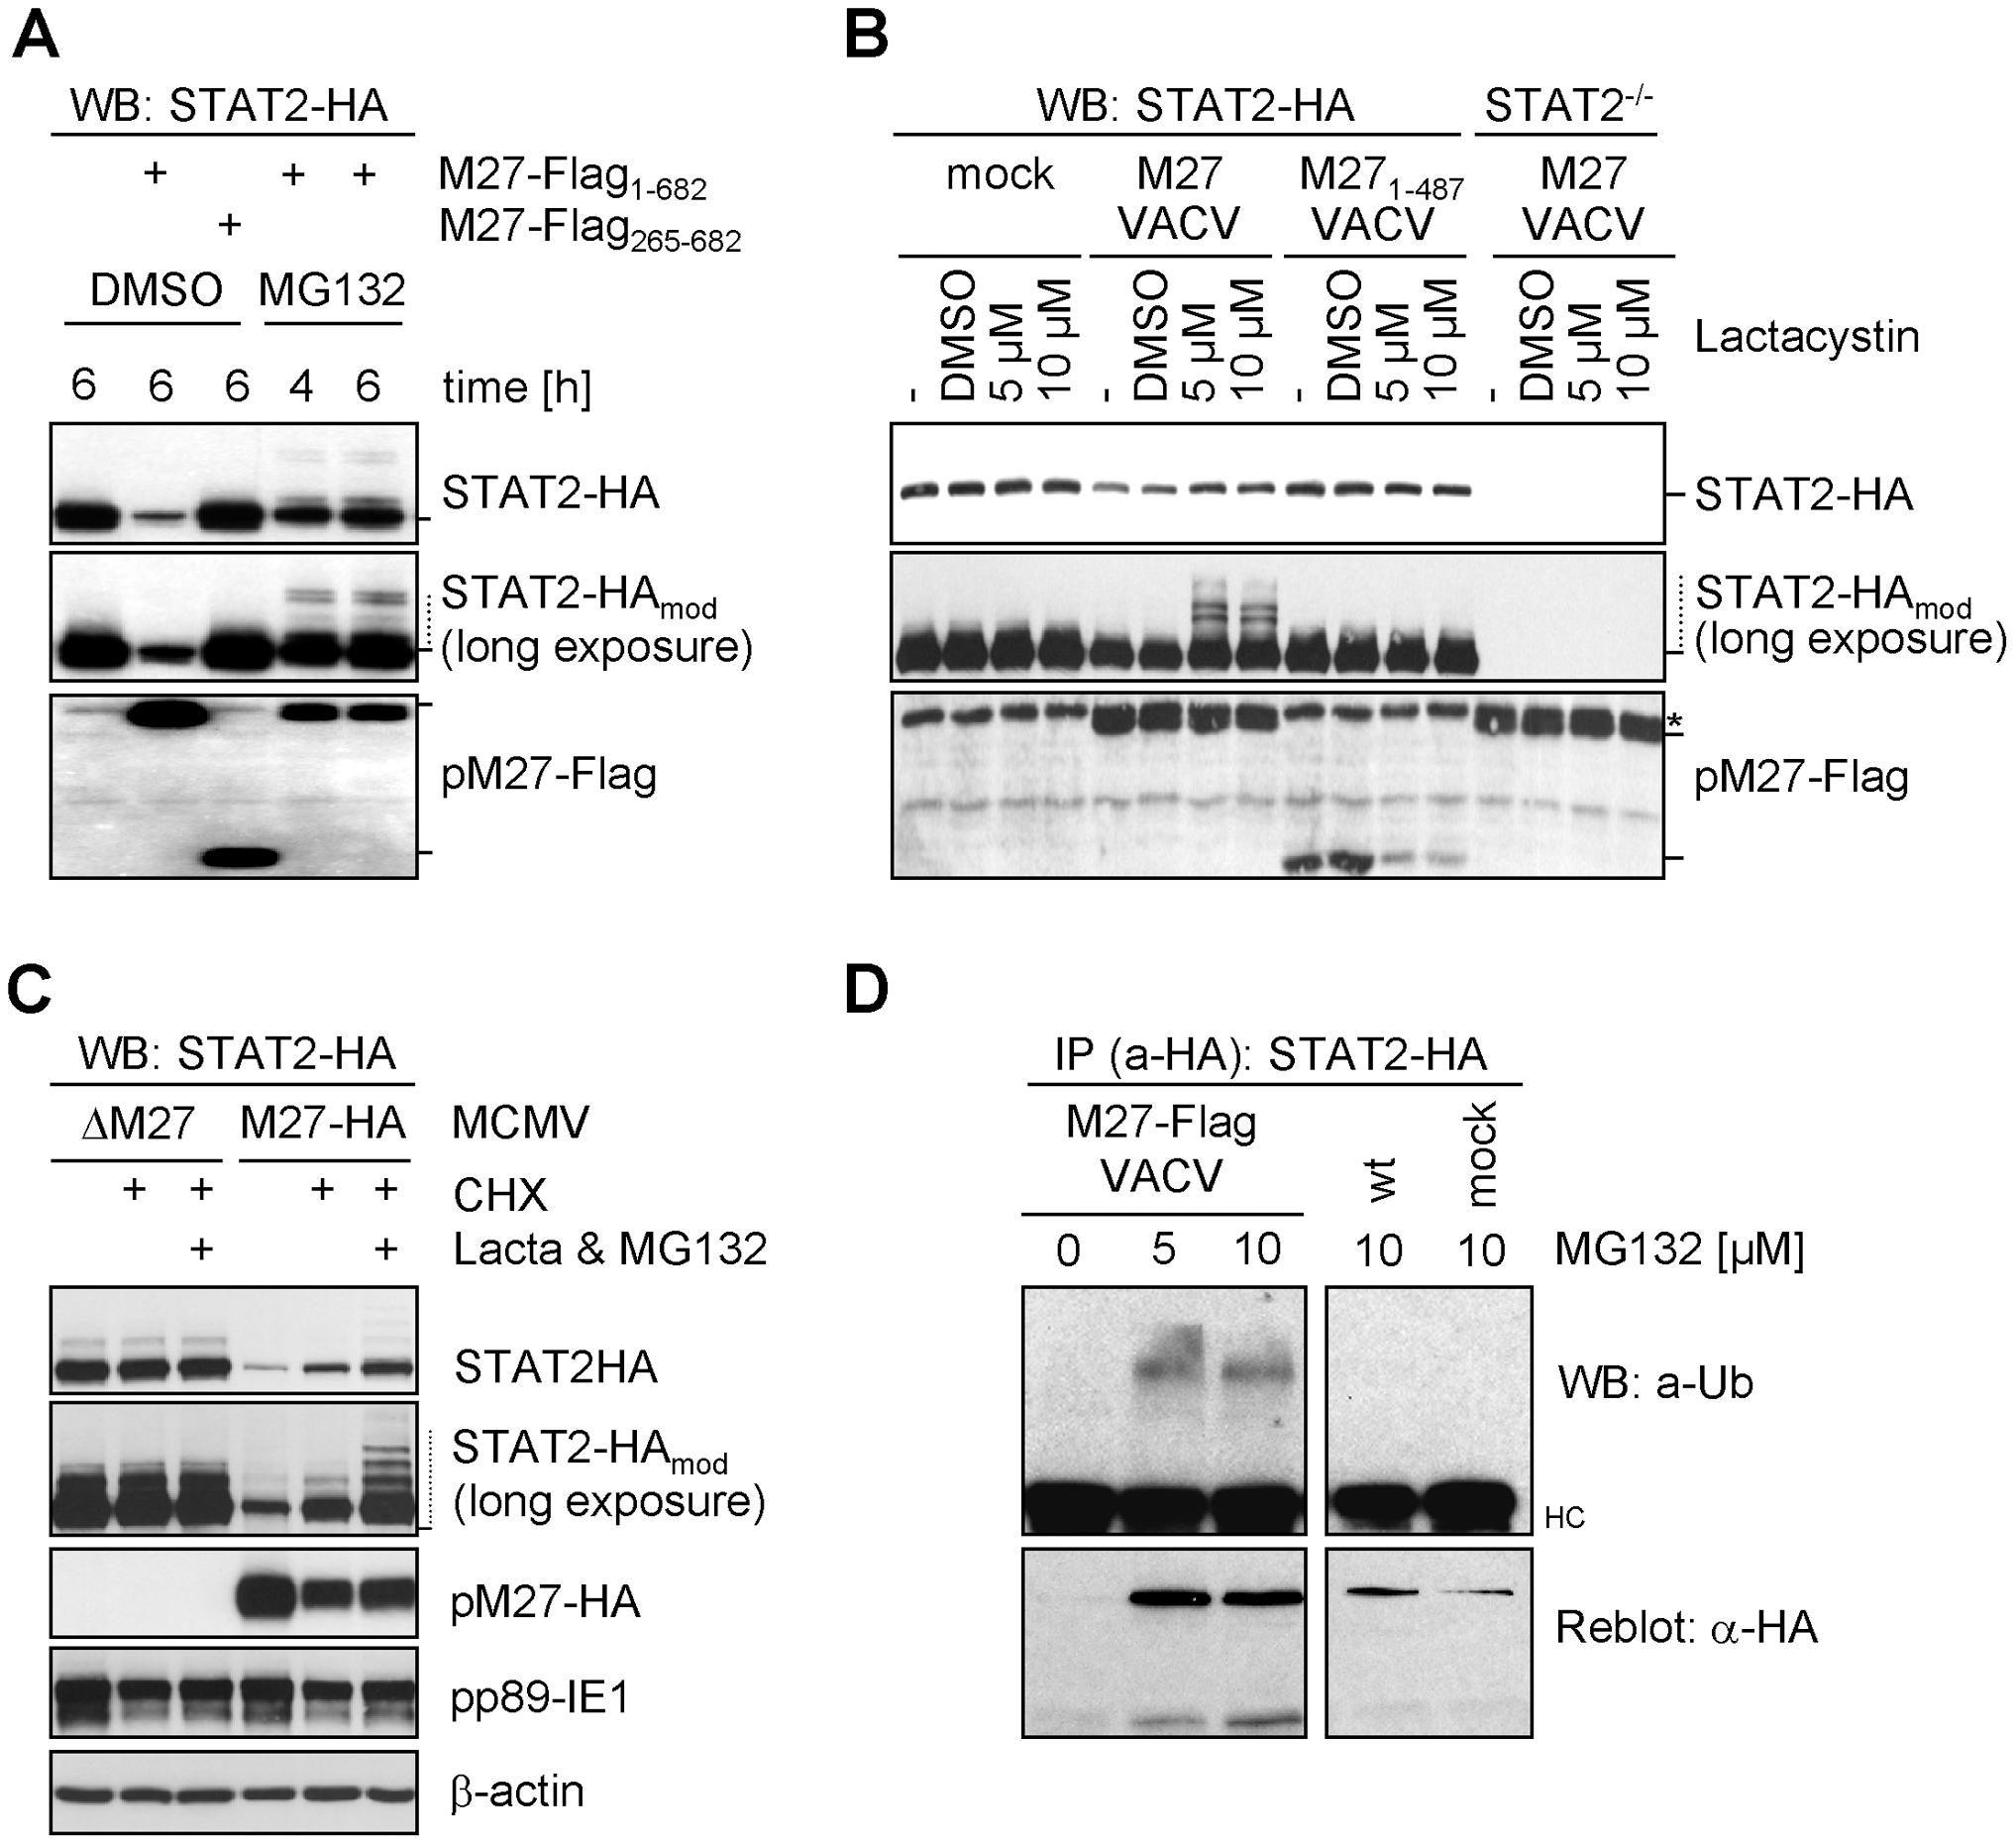 pM27 facilitates the proteasome to degrade STAT2.